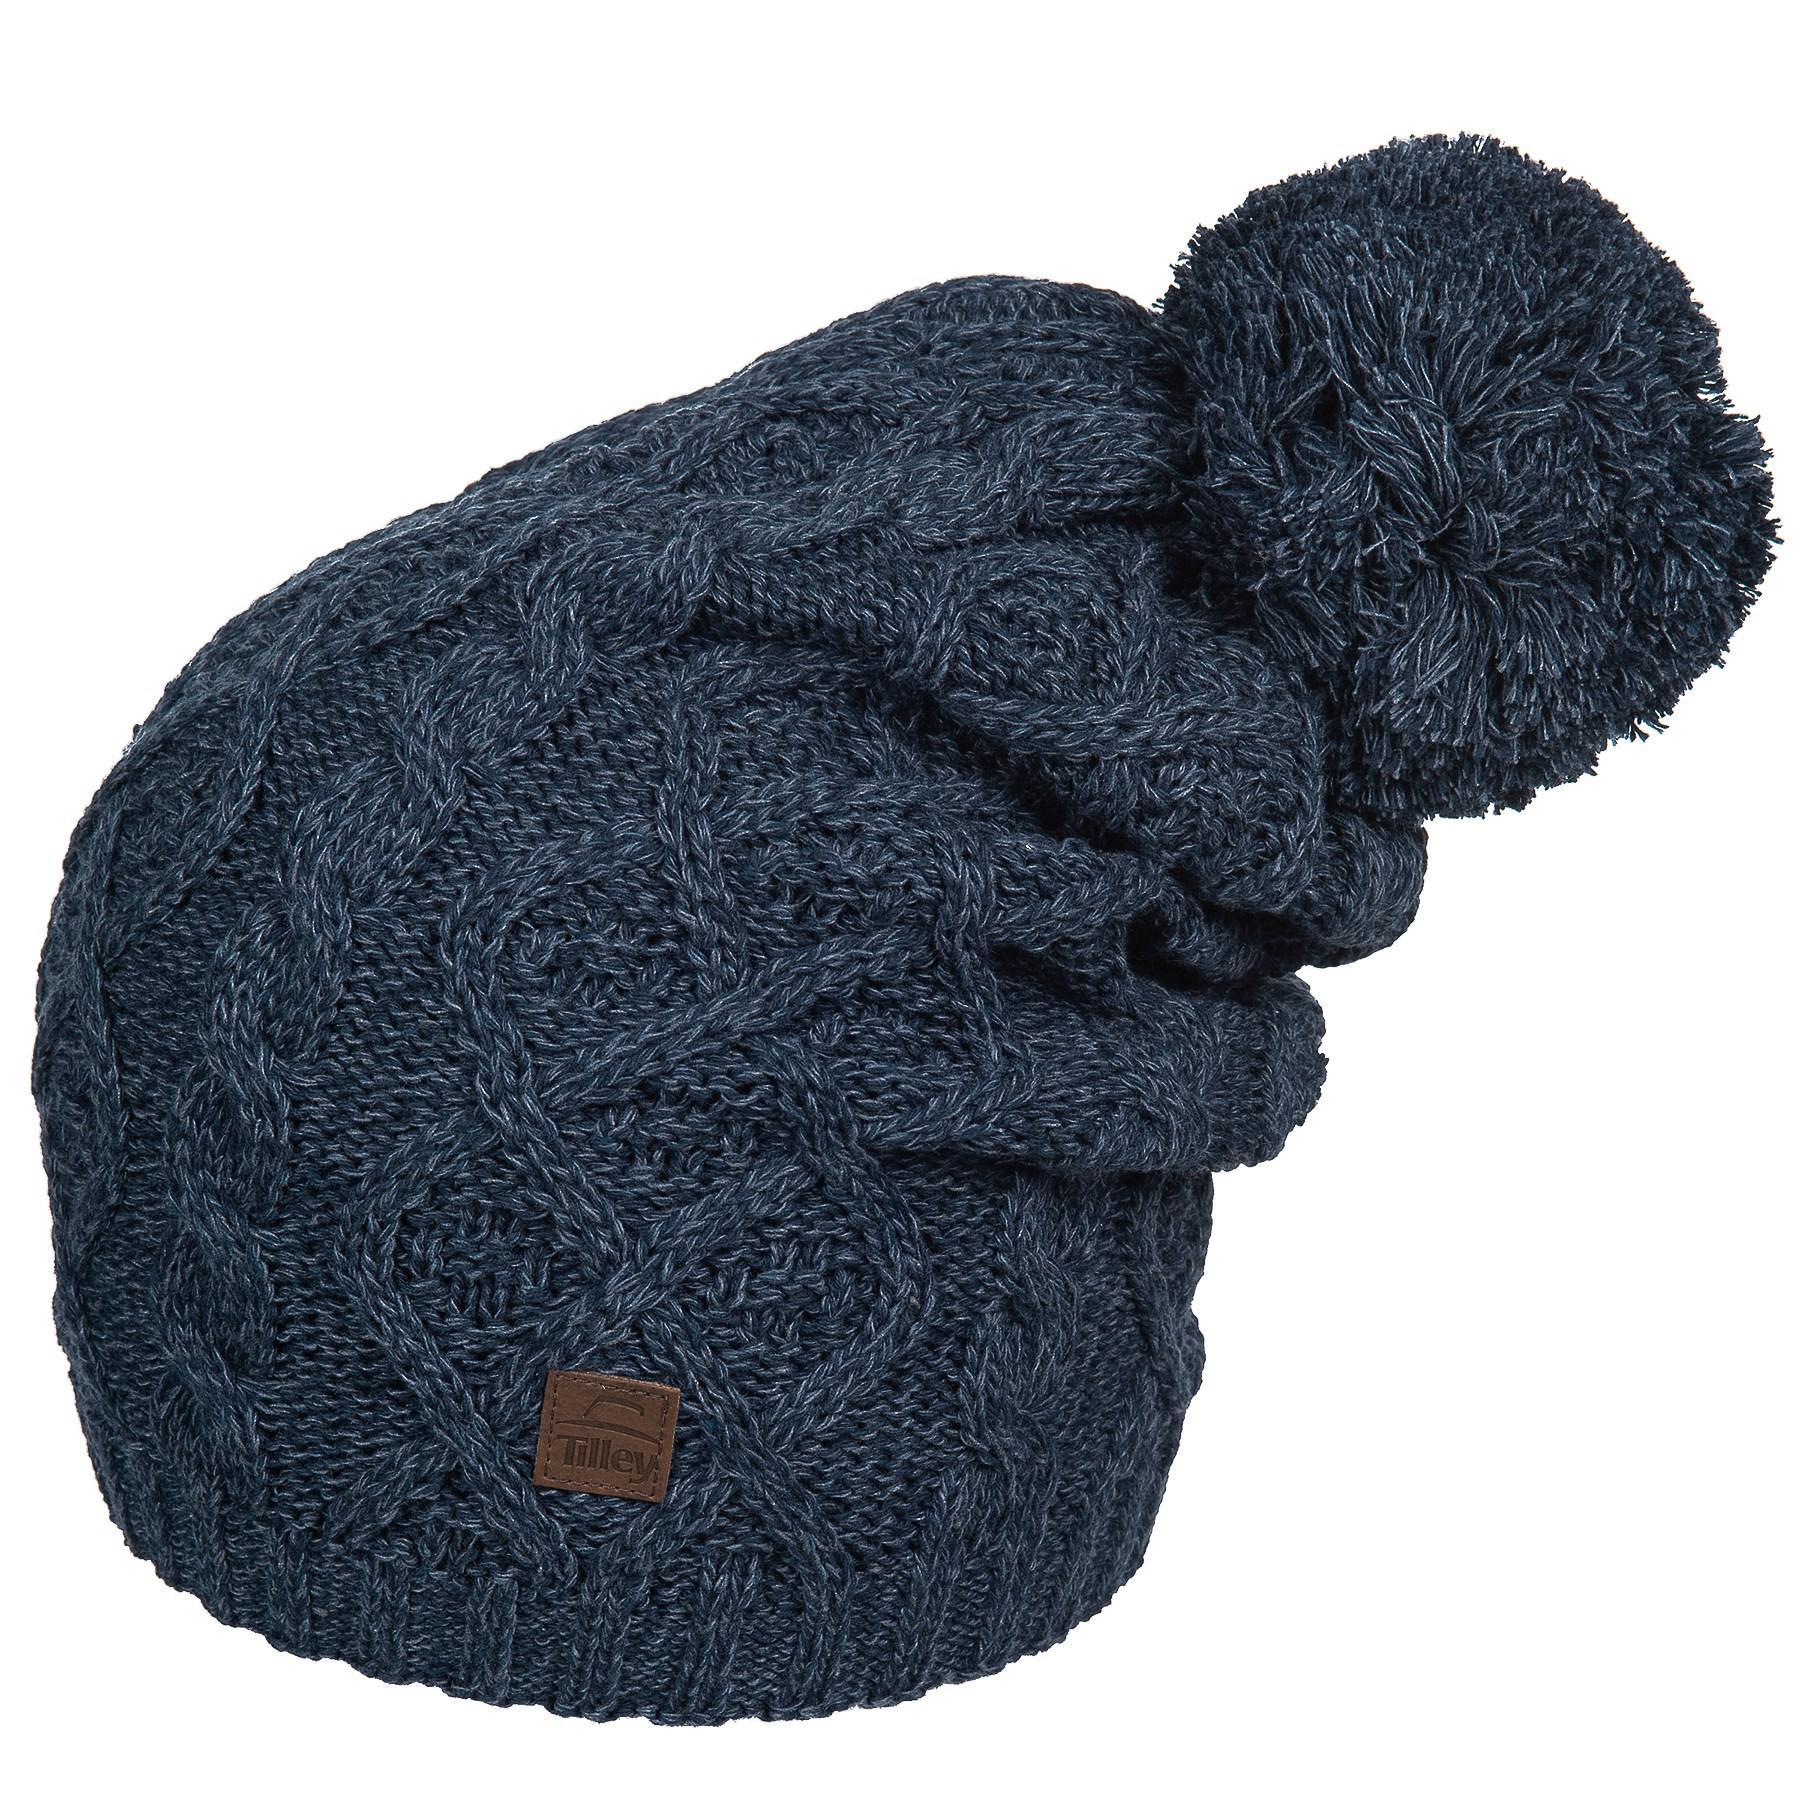 2b4823676eedd Tilley Aspen Toque Hat (for Women) in Blue - Lyst